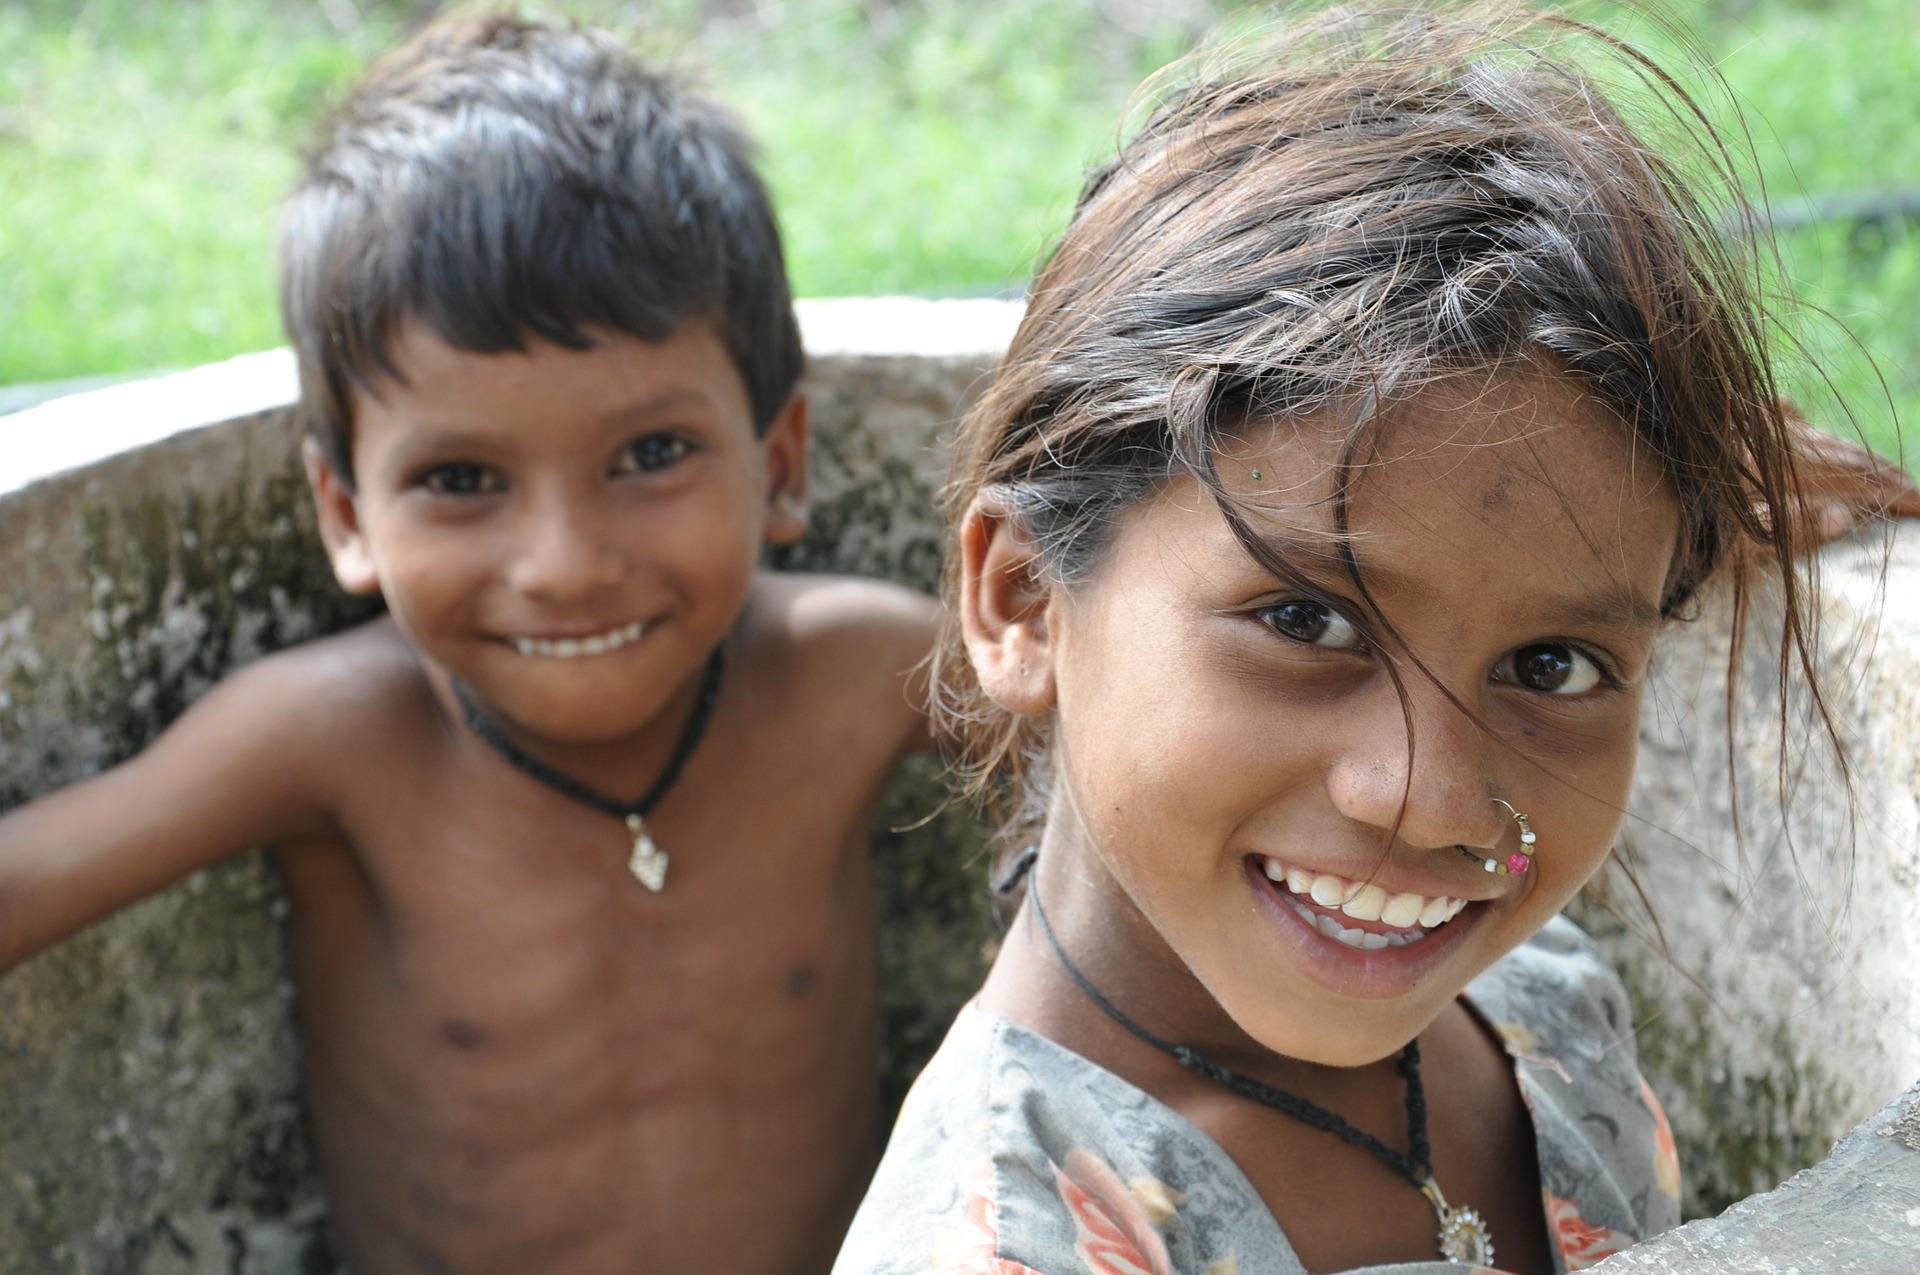 children-82272_1920.jpg